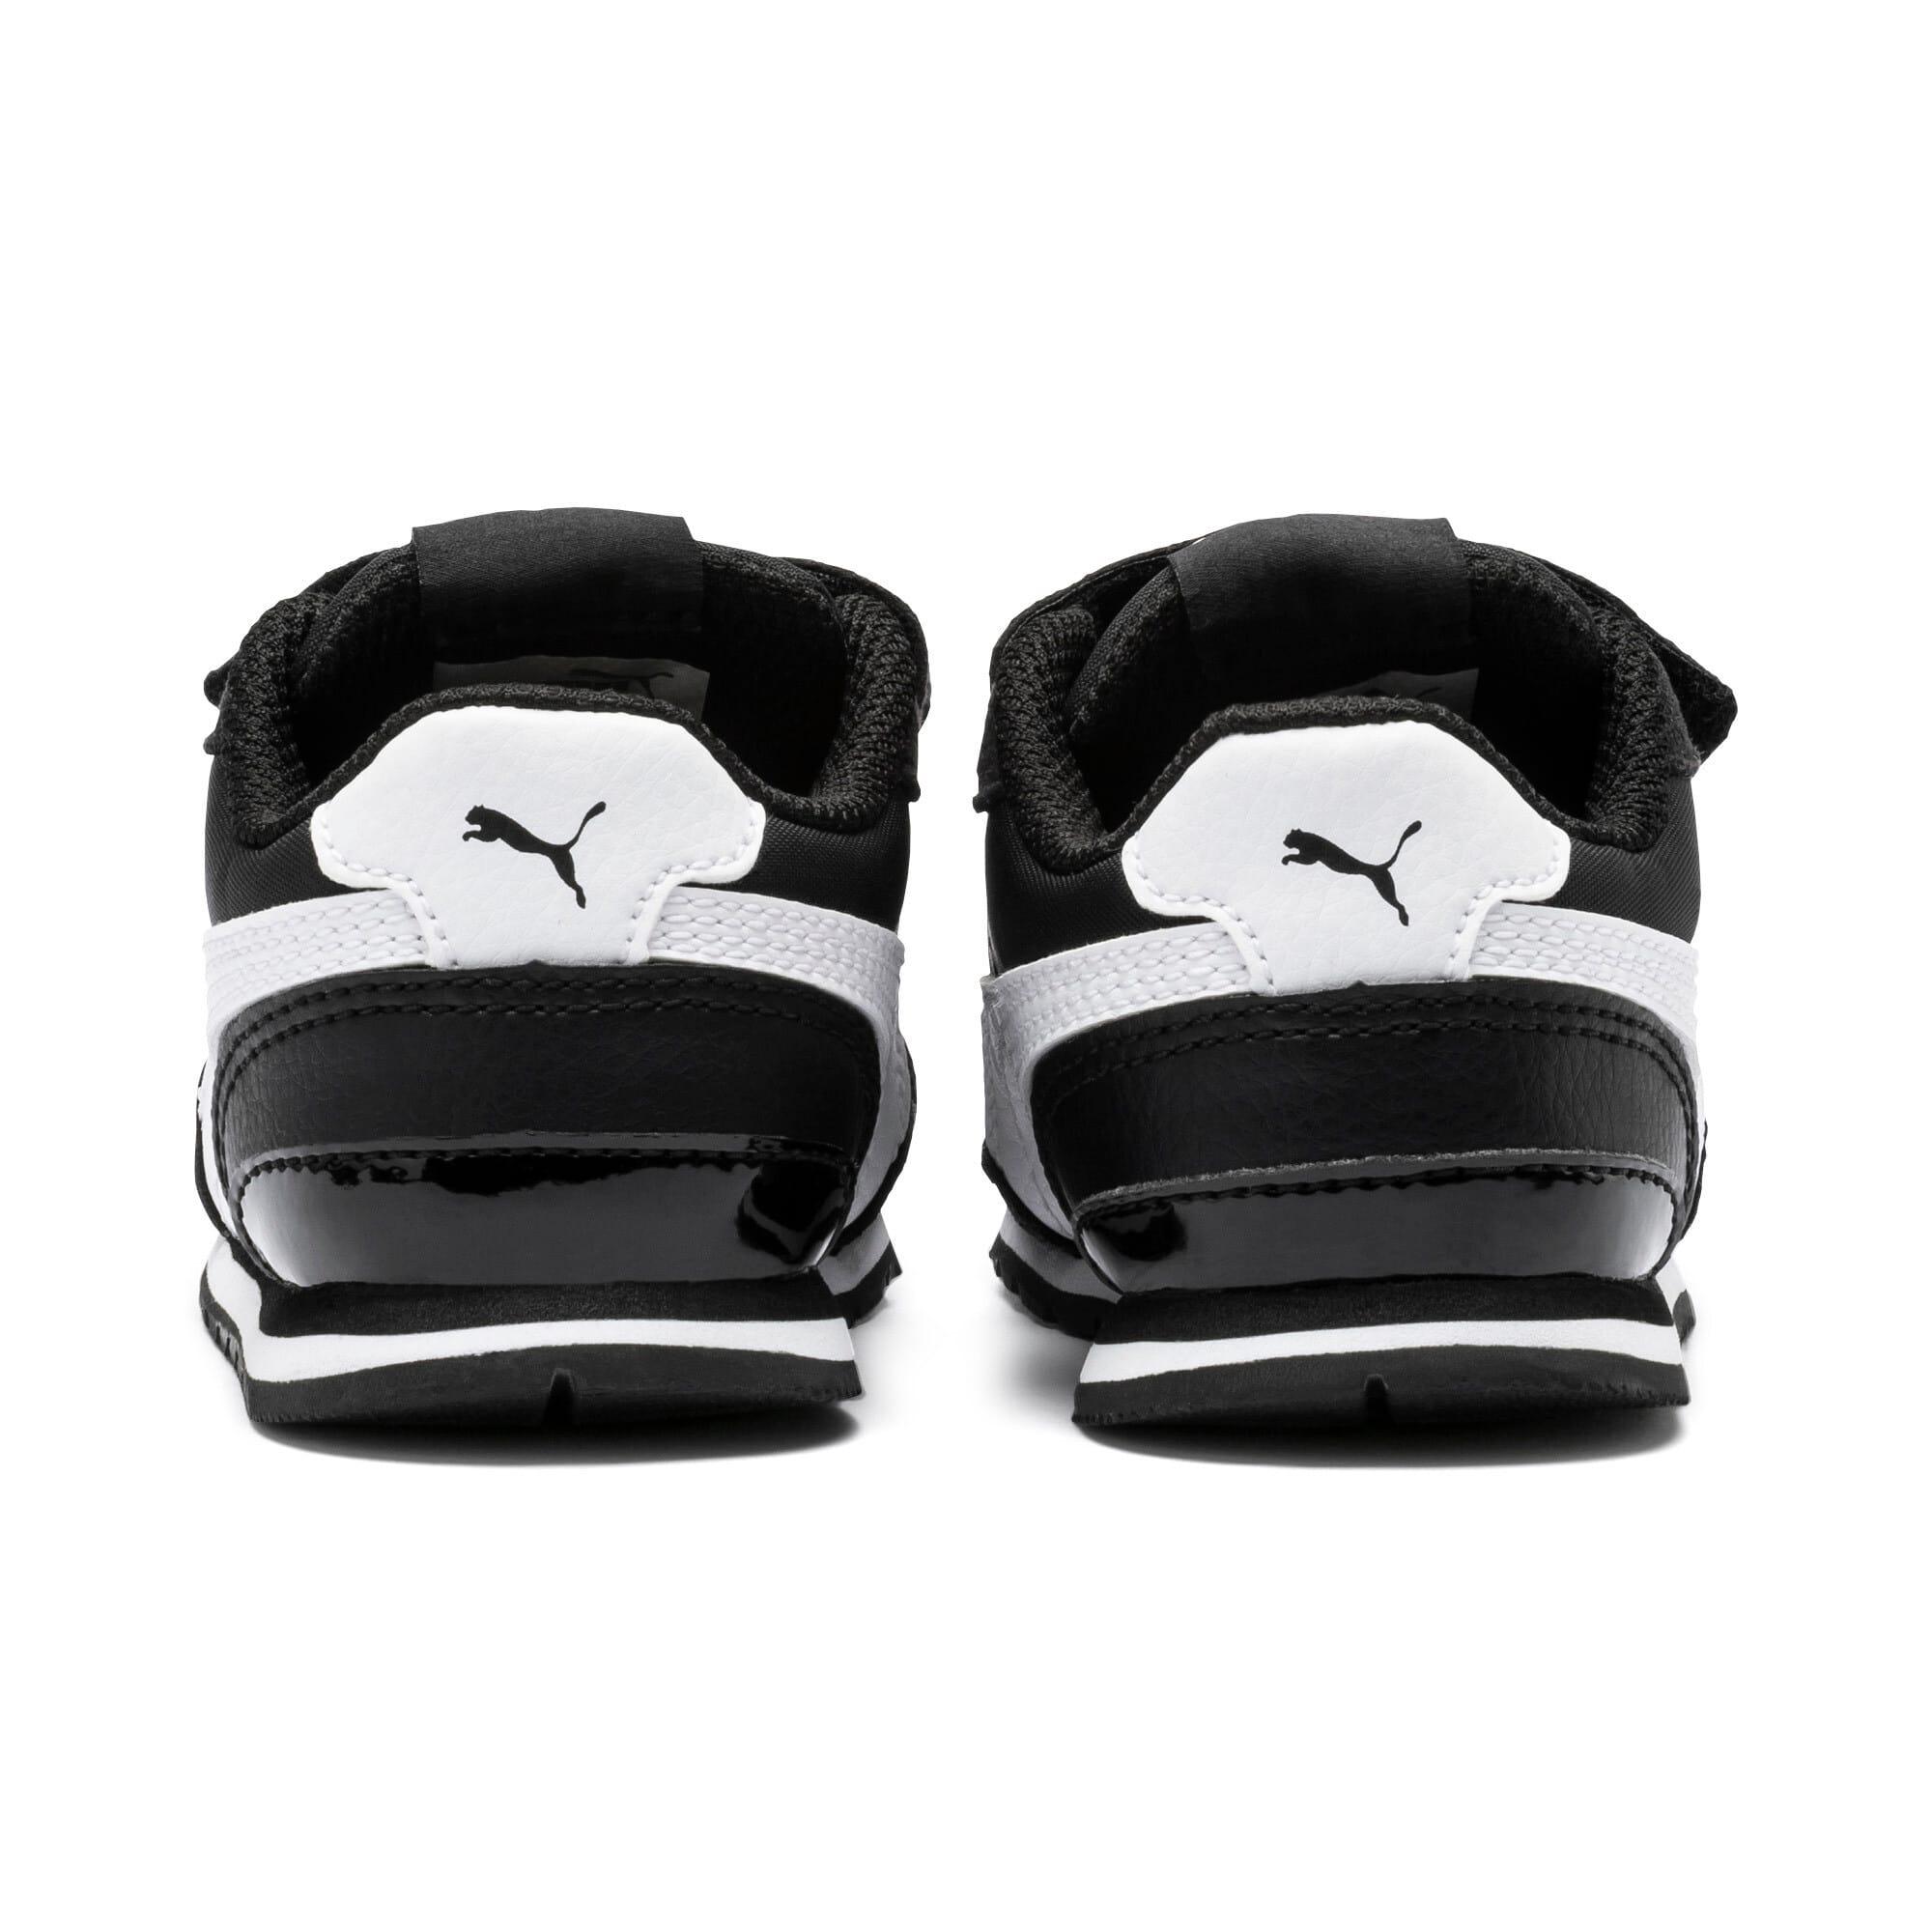 Thumbnail 3 of ST Runner v2 Little Kids' Shoes, Puma Black-Puma White, medium